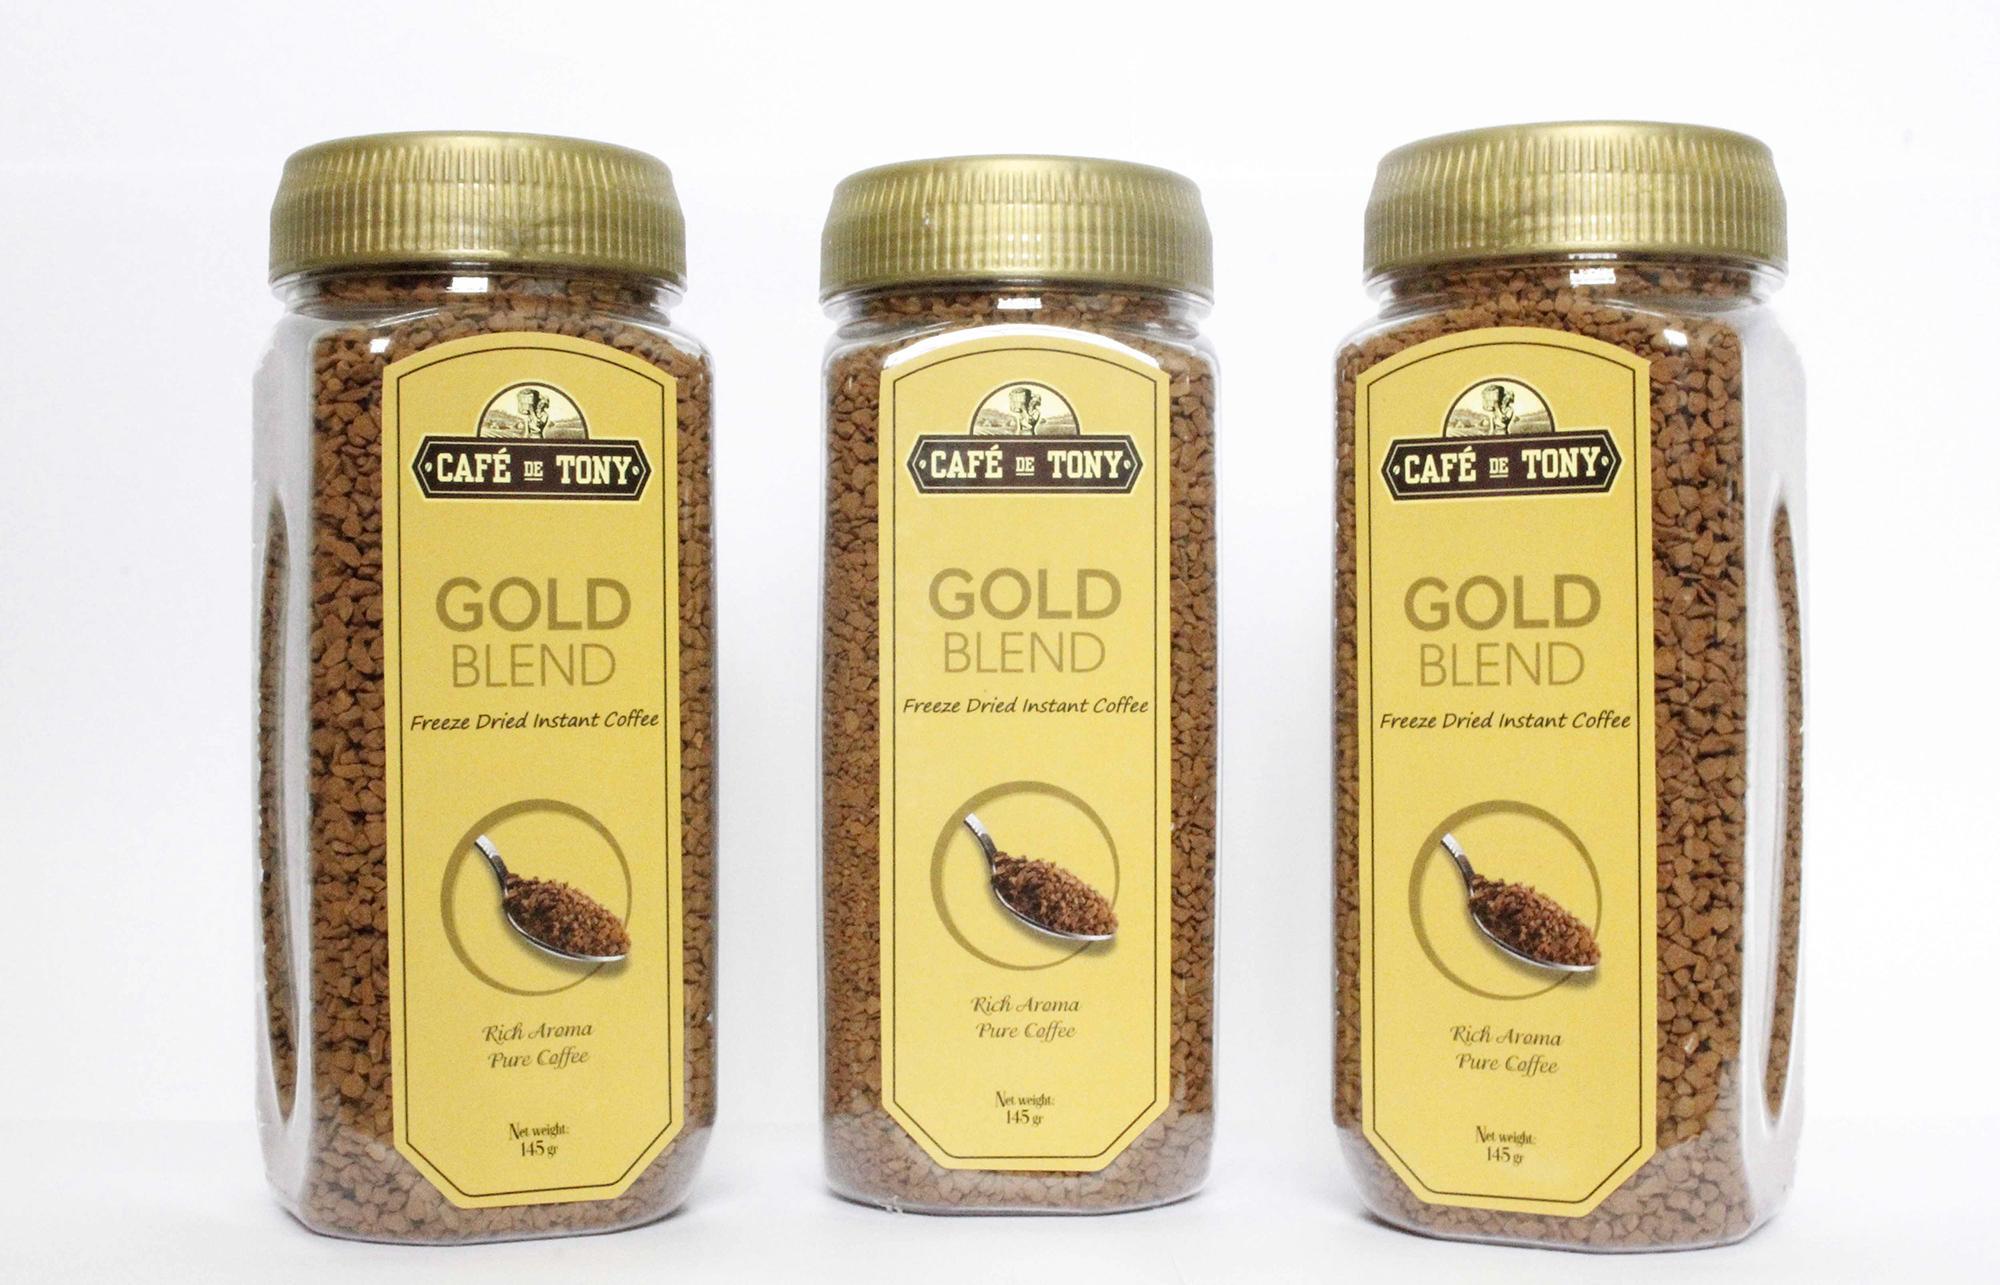 ca-phe-hoa-tan-say-lanh-cafe-de-tony-gold-blend-145 gram.jpg